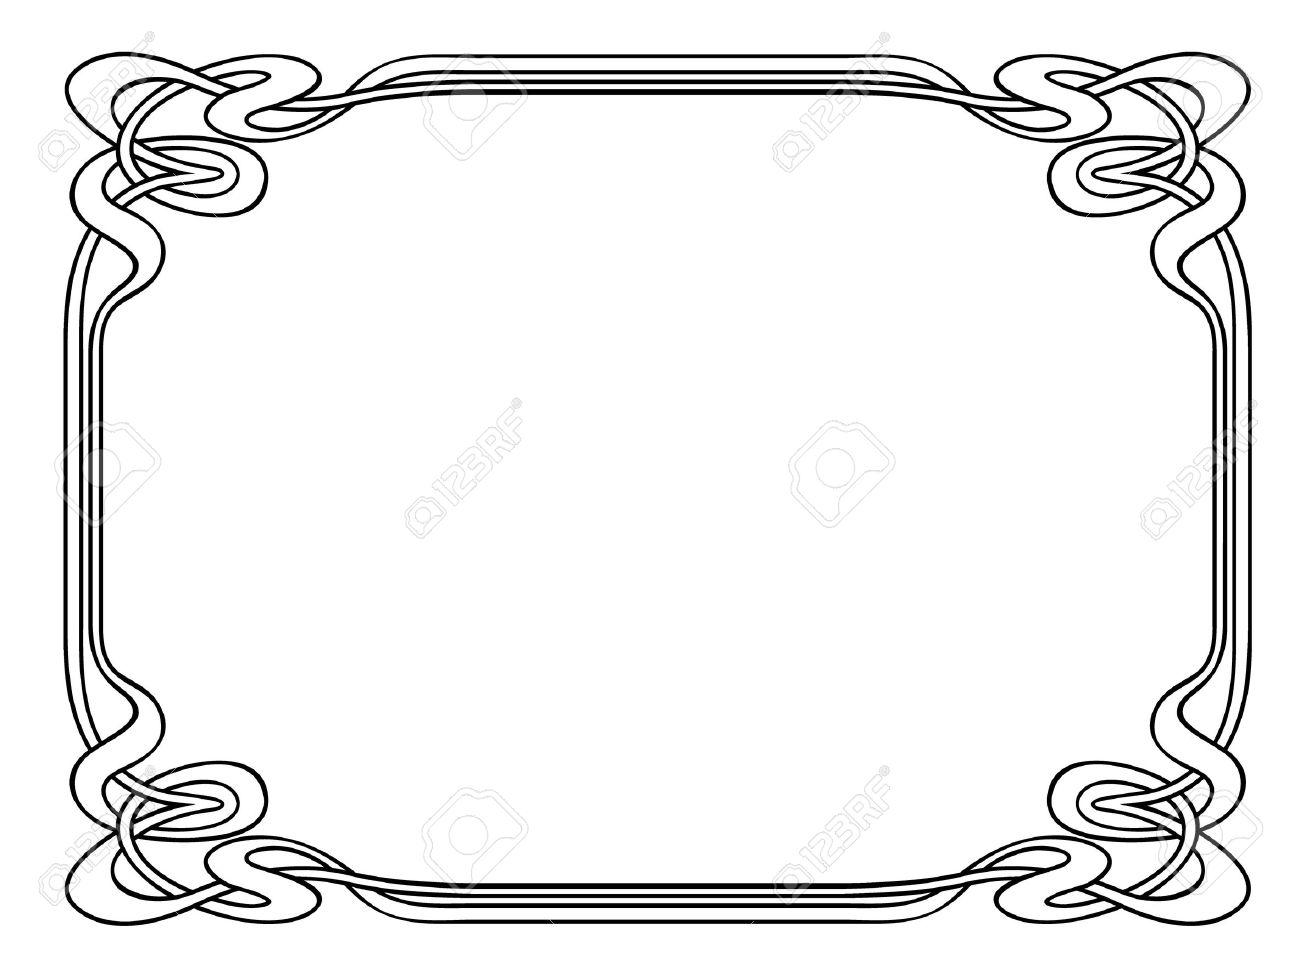 Vector art nouveau modern ornamental decorative frame Stock Vector - 9716219